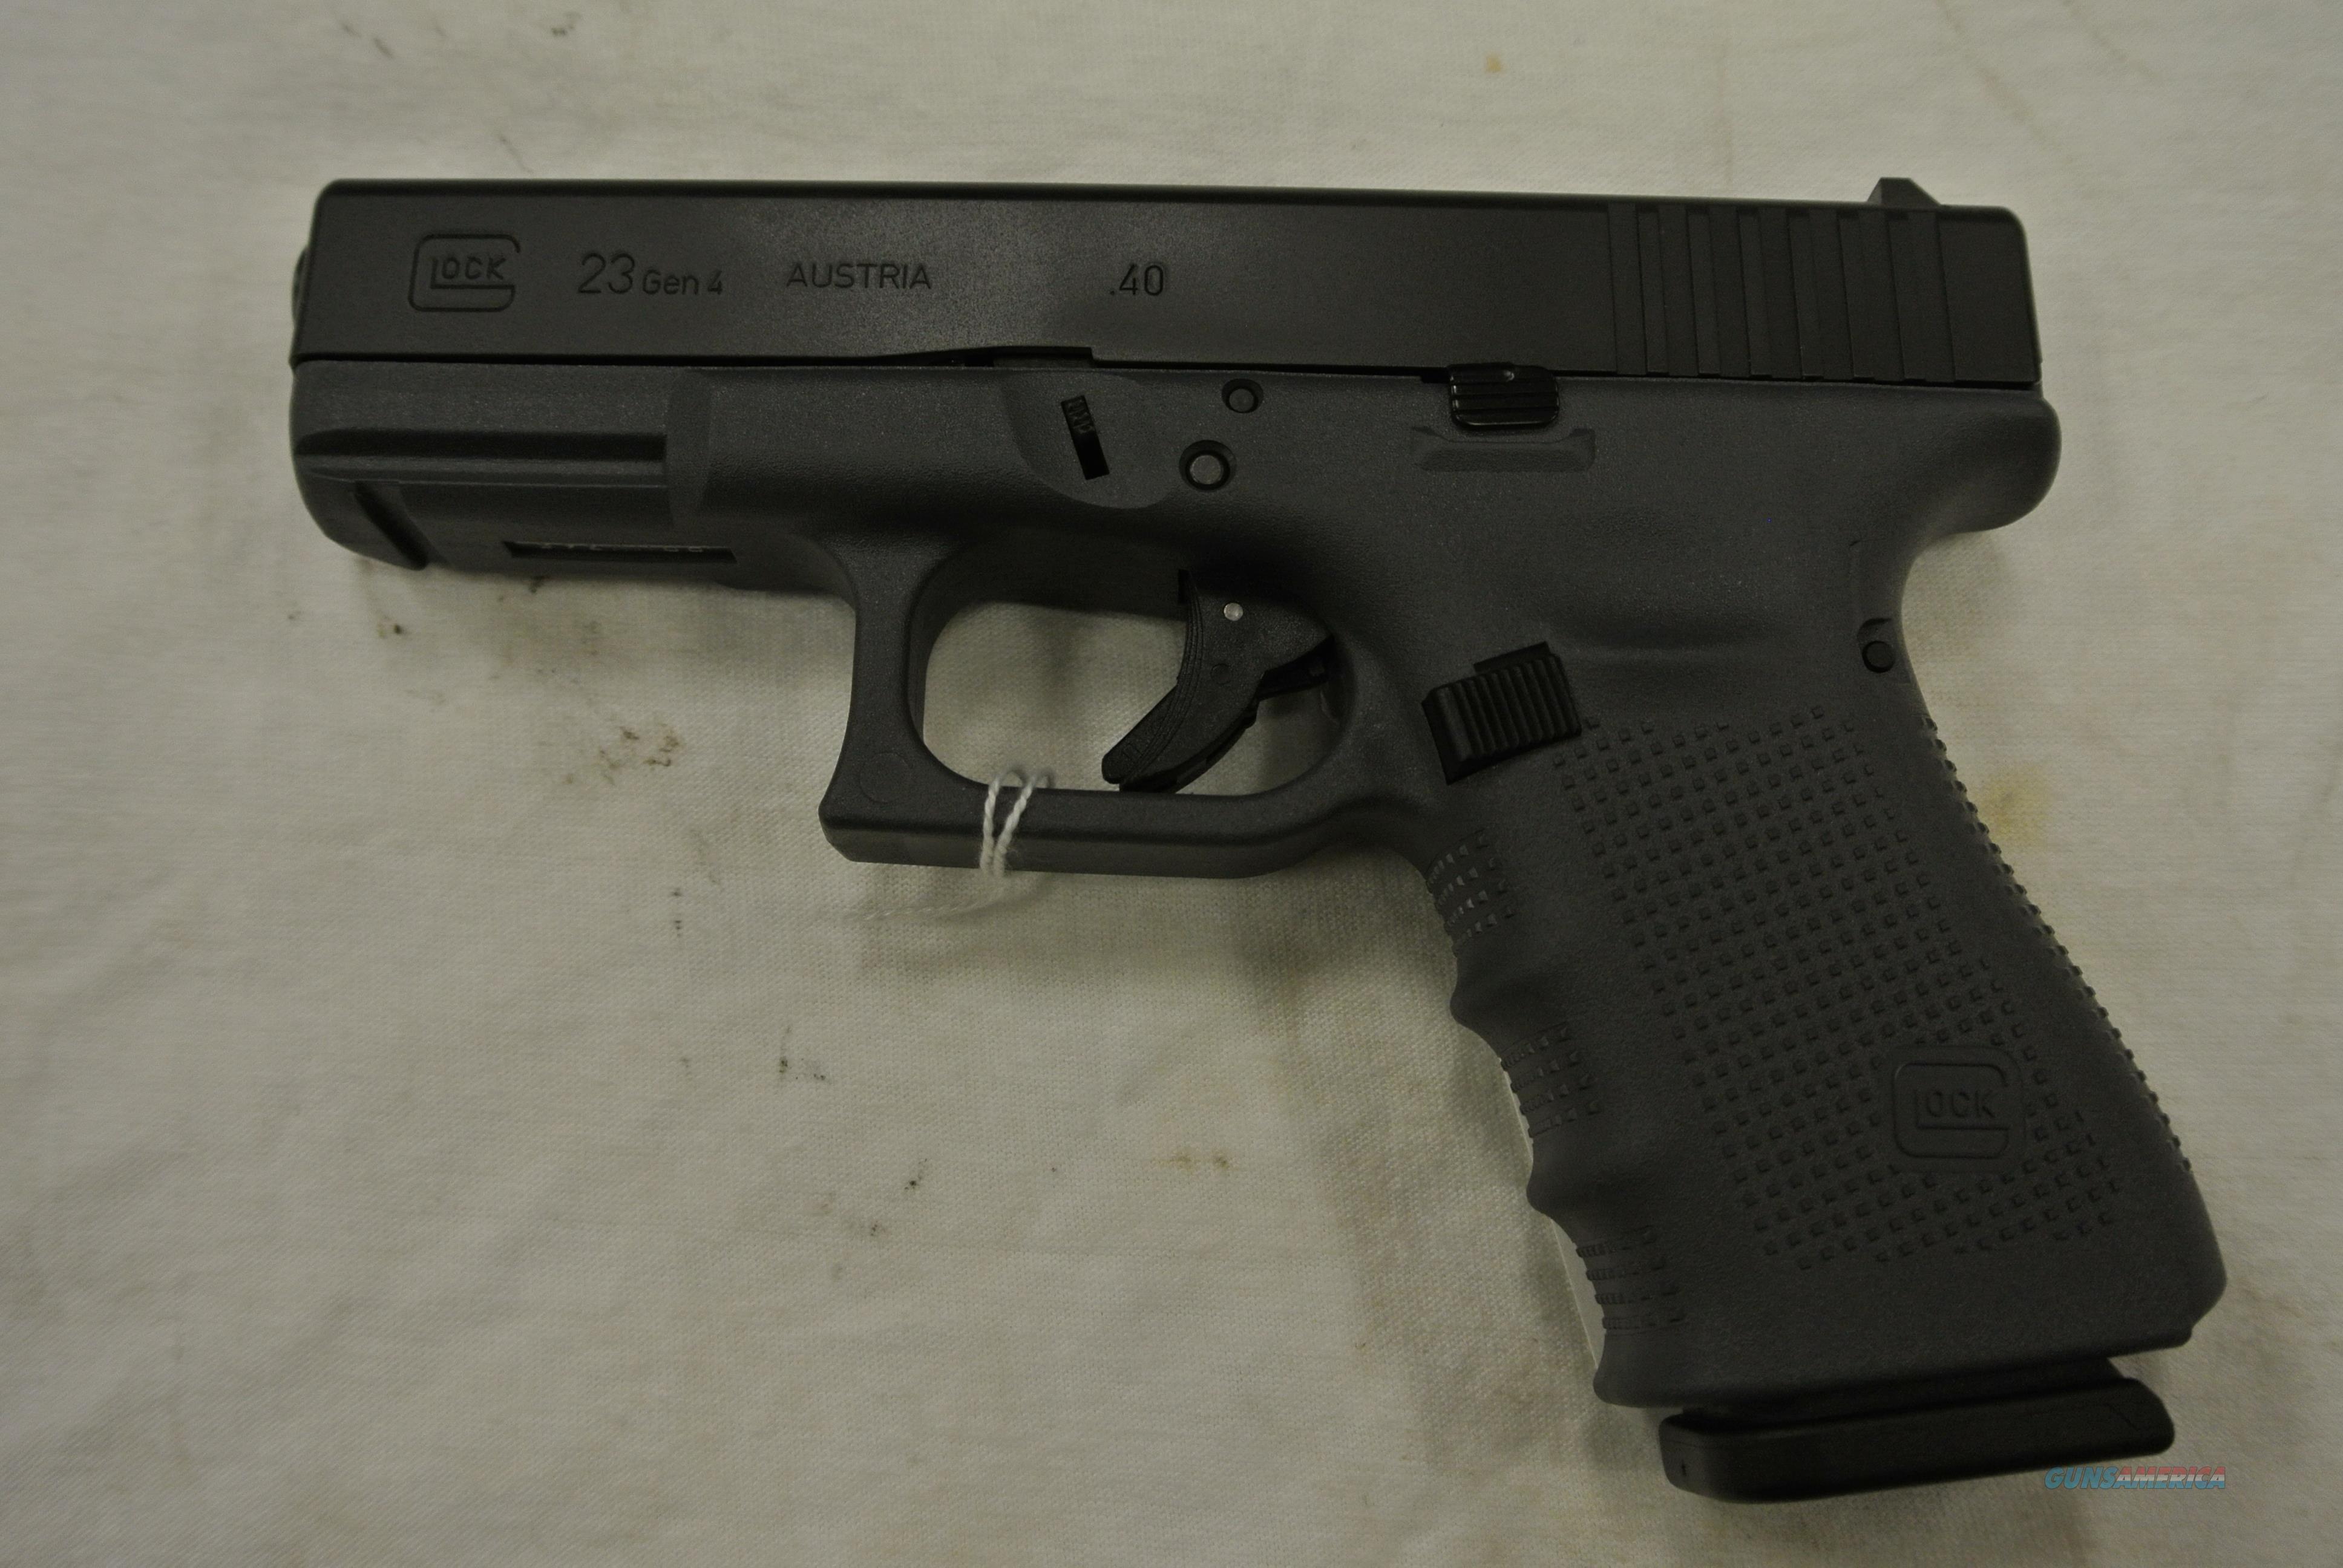 Glock 23 Gen 4 40 S&W pistol, Limited Edition G... for sale